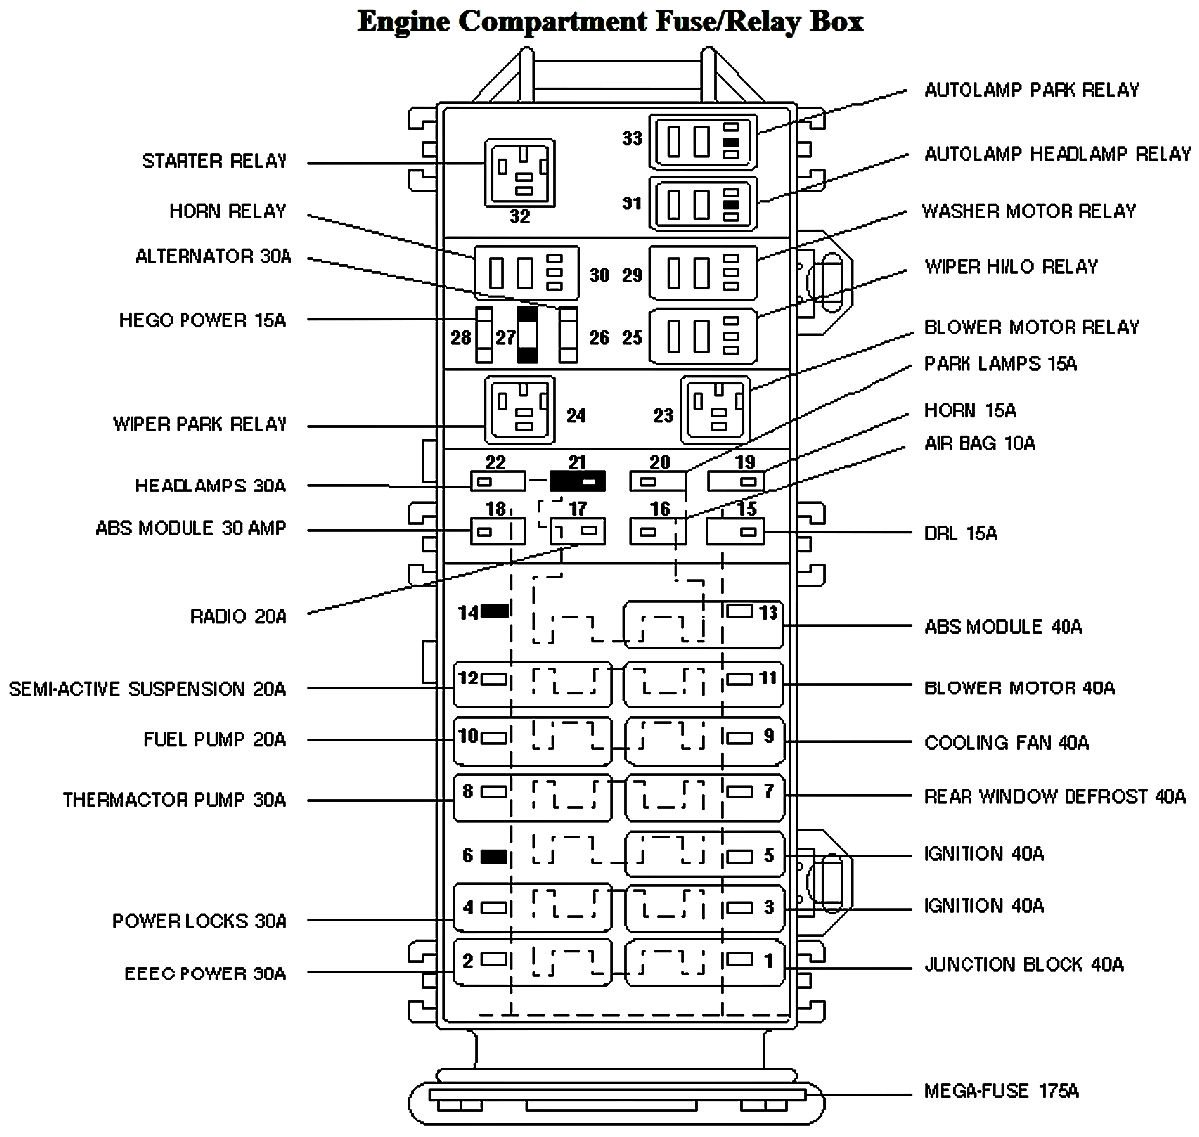 2003 Mercury Mountaineer Fuse Diagram Power Plant Circuit Diagram 1990 300zx Citroen Wirings1 Jeanjaures37 Fr